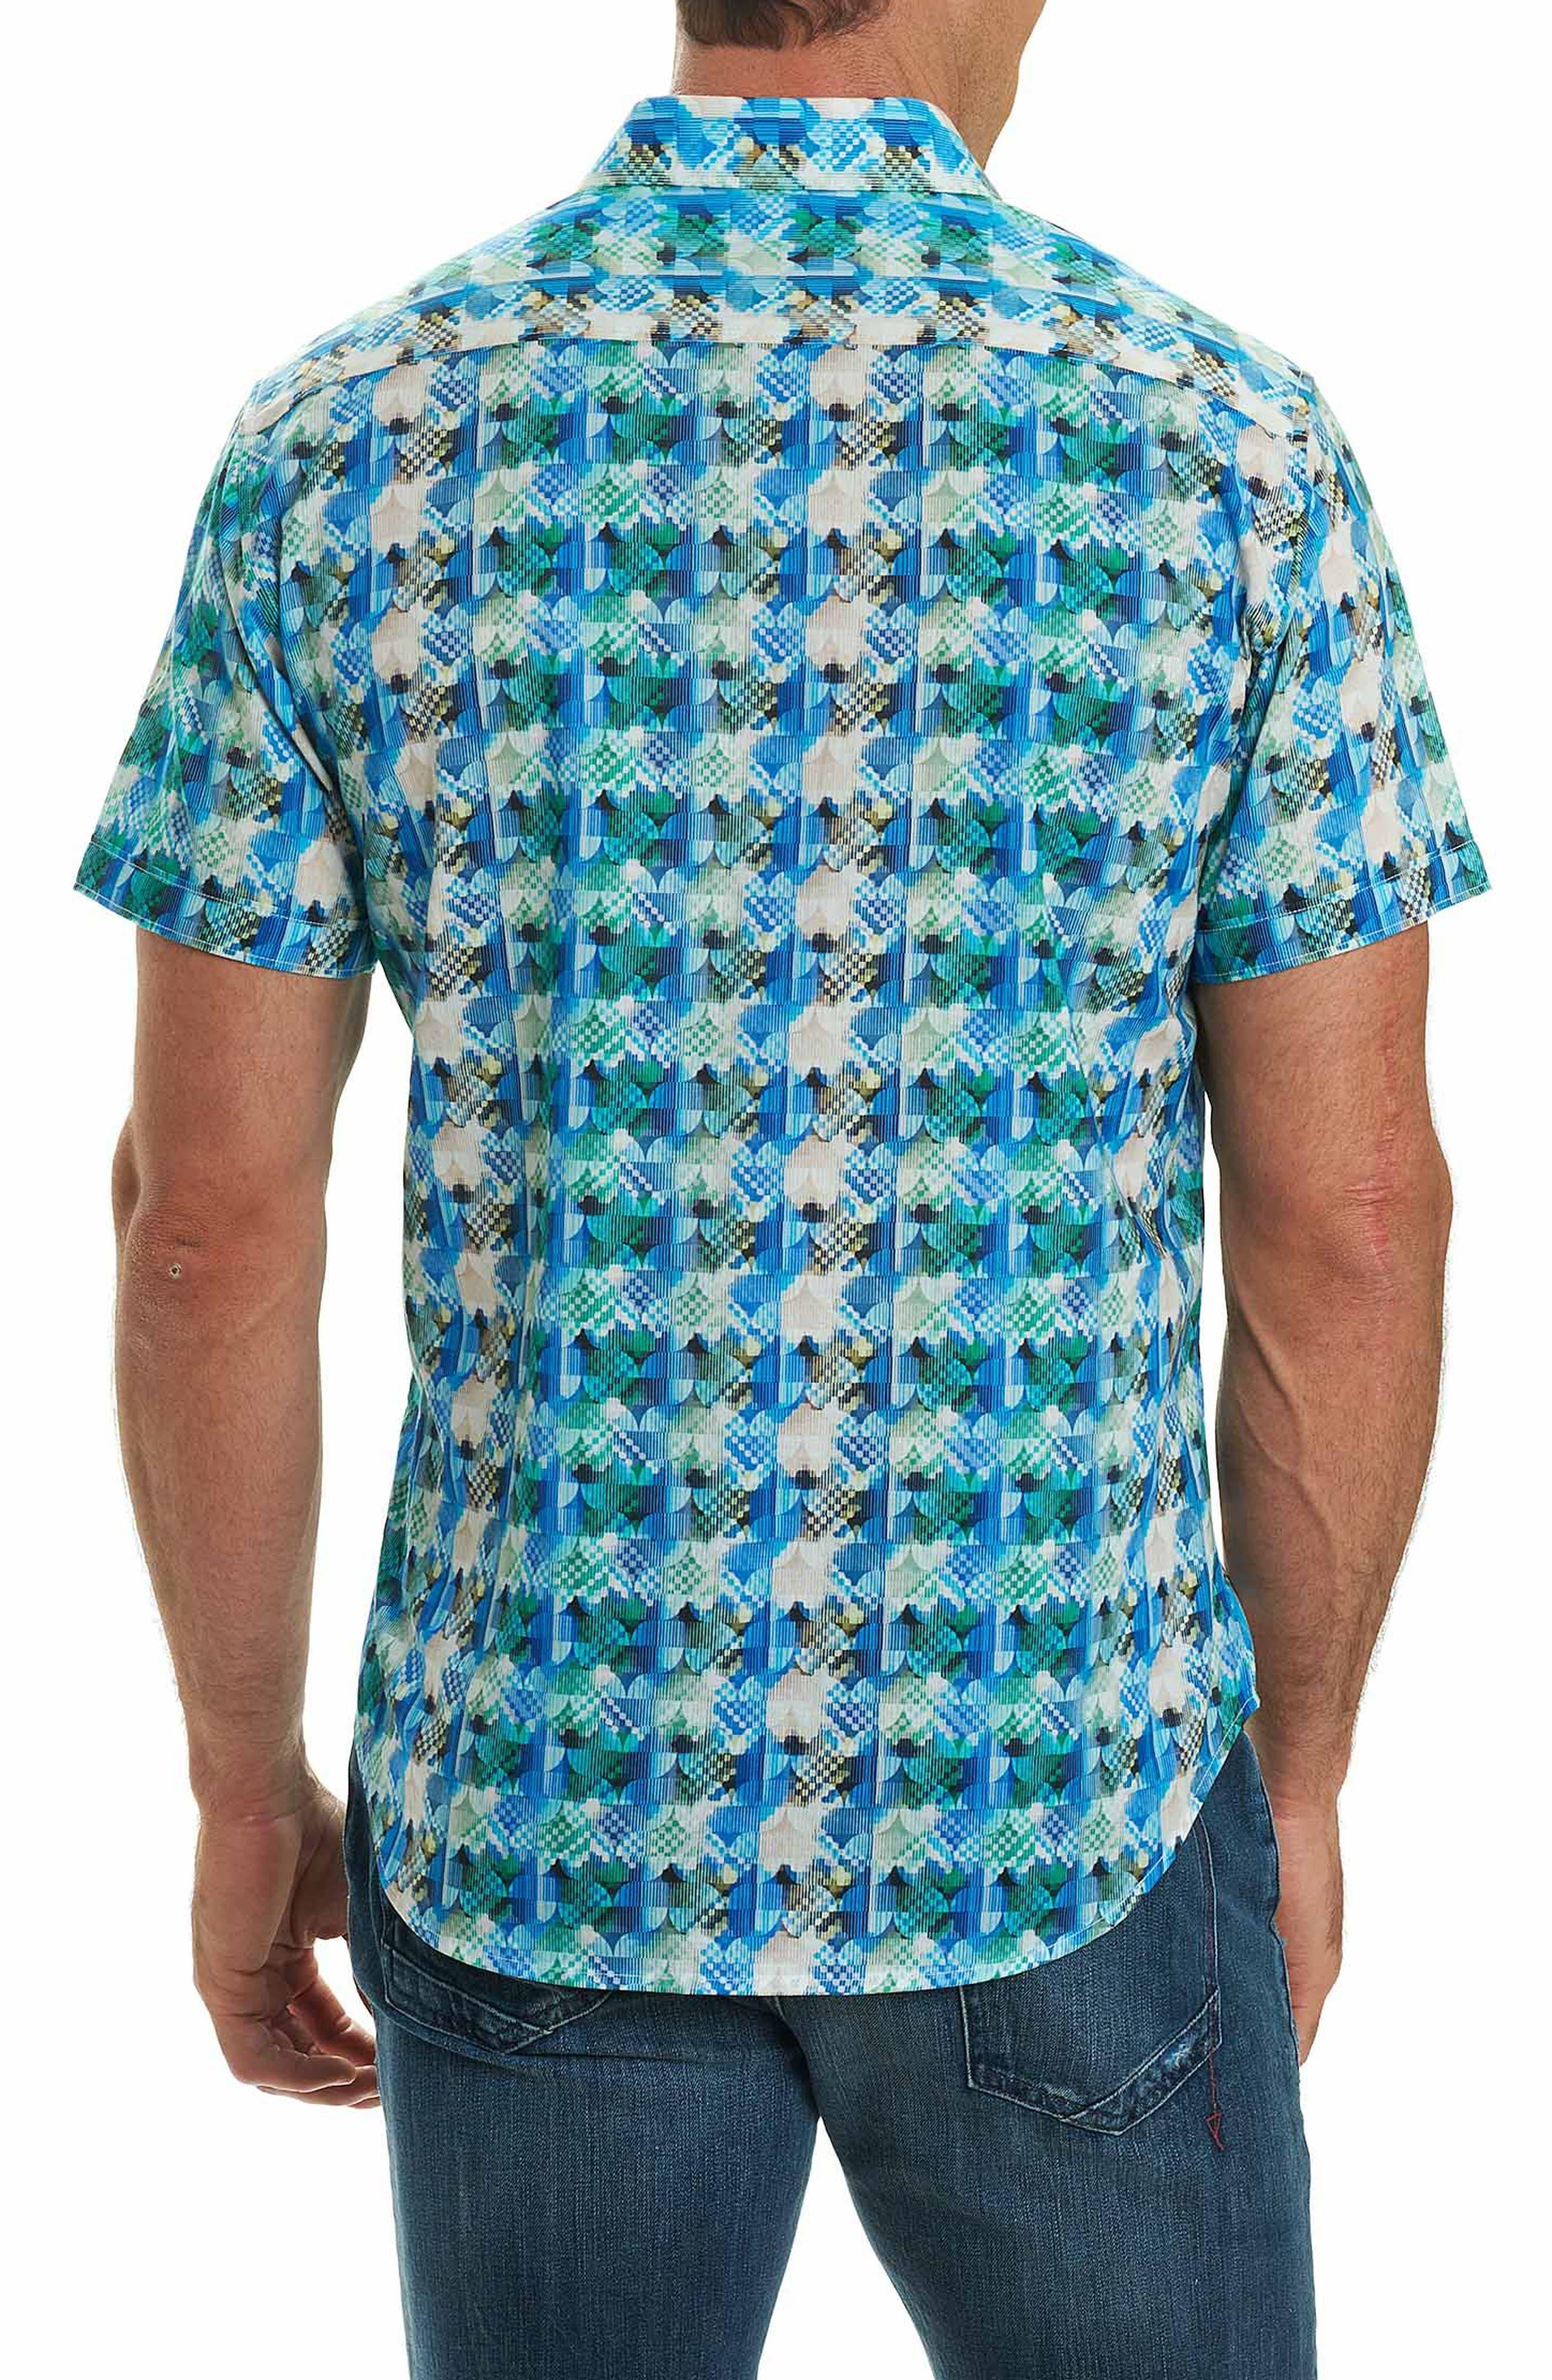 Illusions Sport Shirt,                             Alternate thumbnail 2, color,                             Turquoise